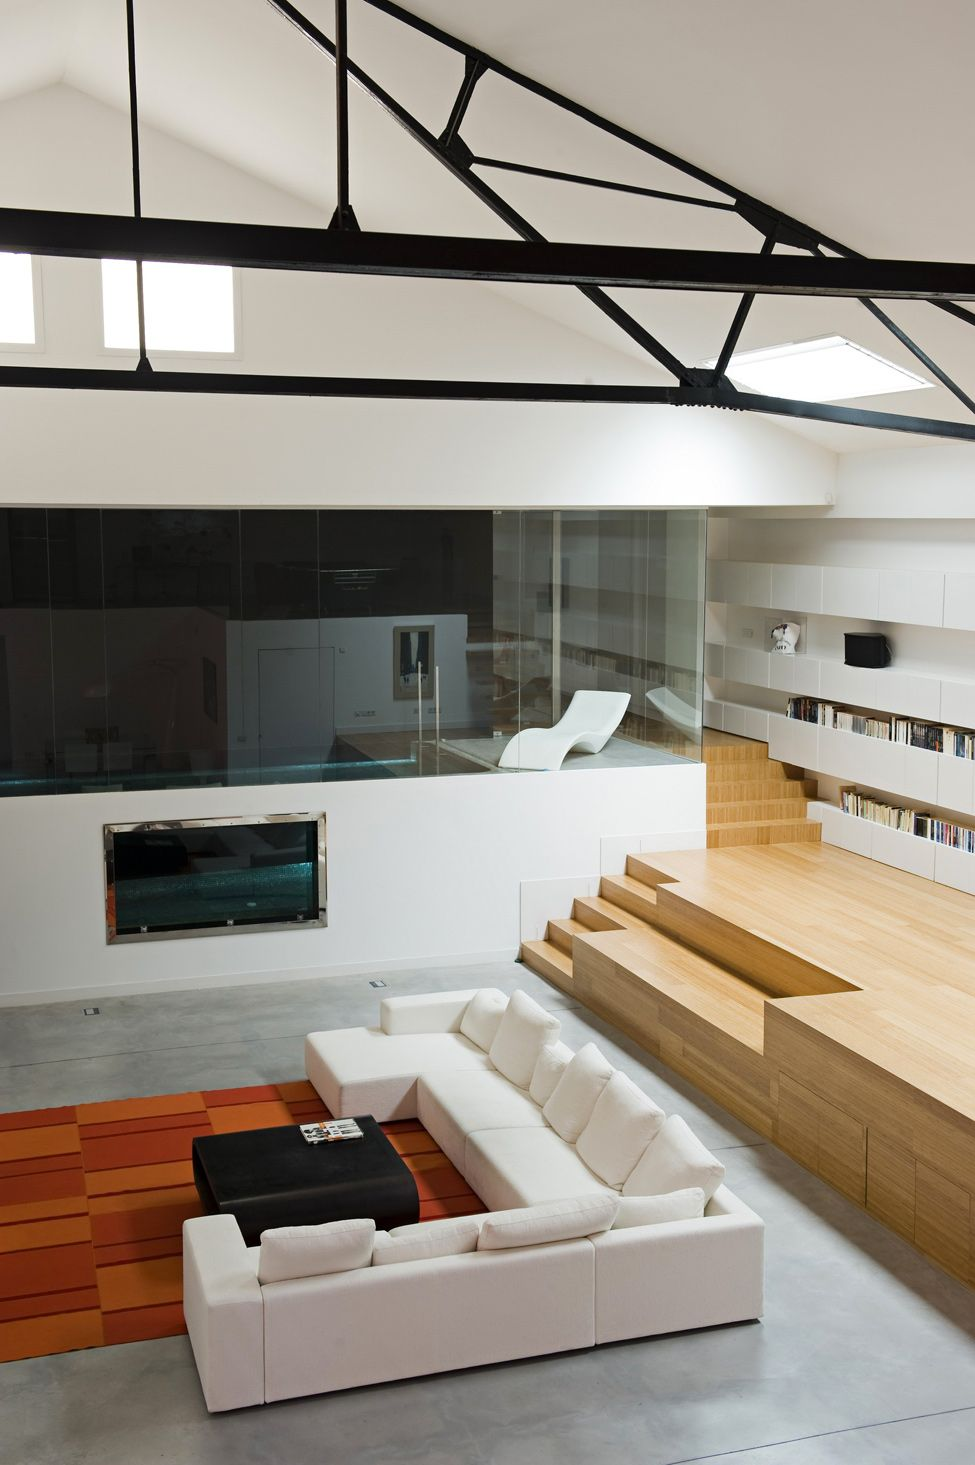 Loft V Zdanii Garazha V Gorode Bordo Franciya Hqroom Loft De Luxe Idee Deco Loft Maison